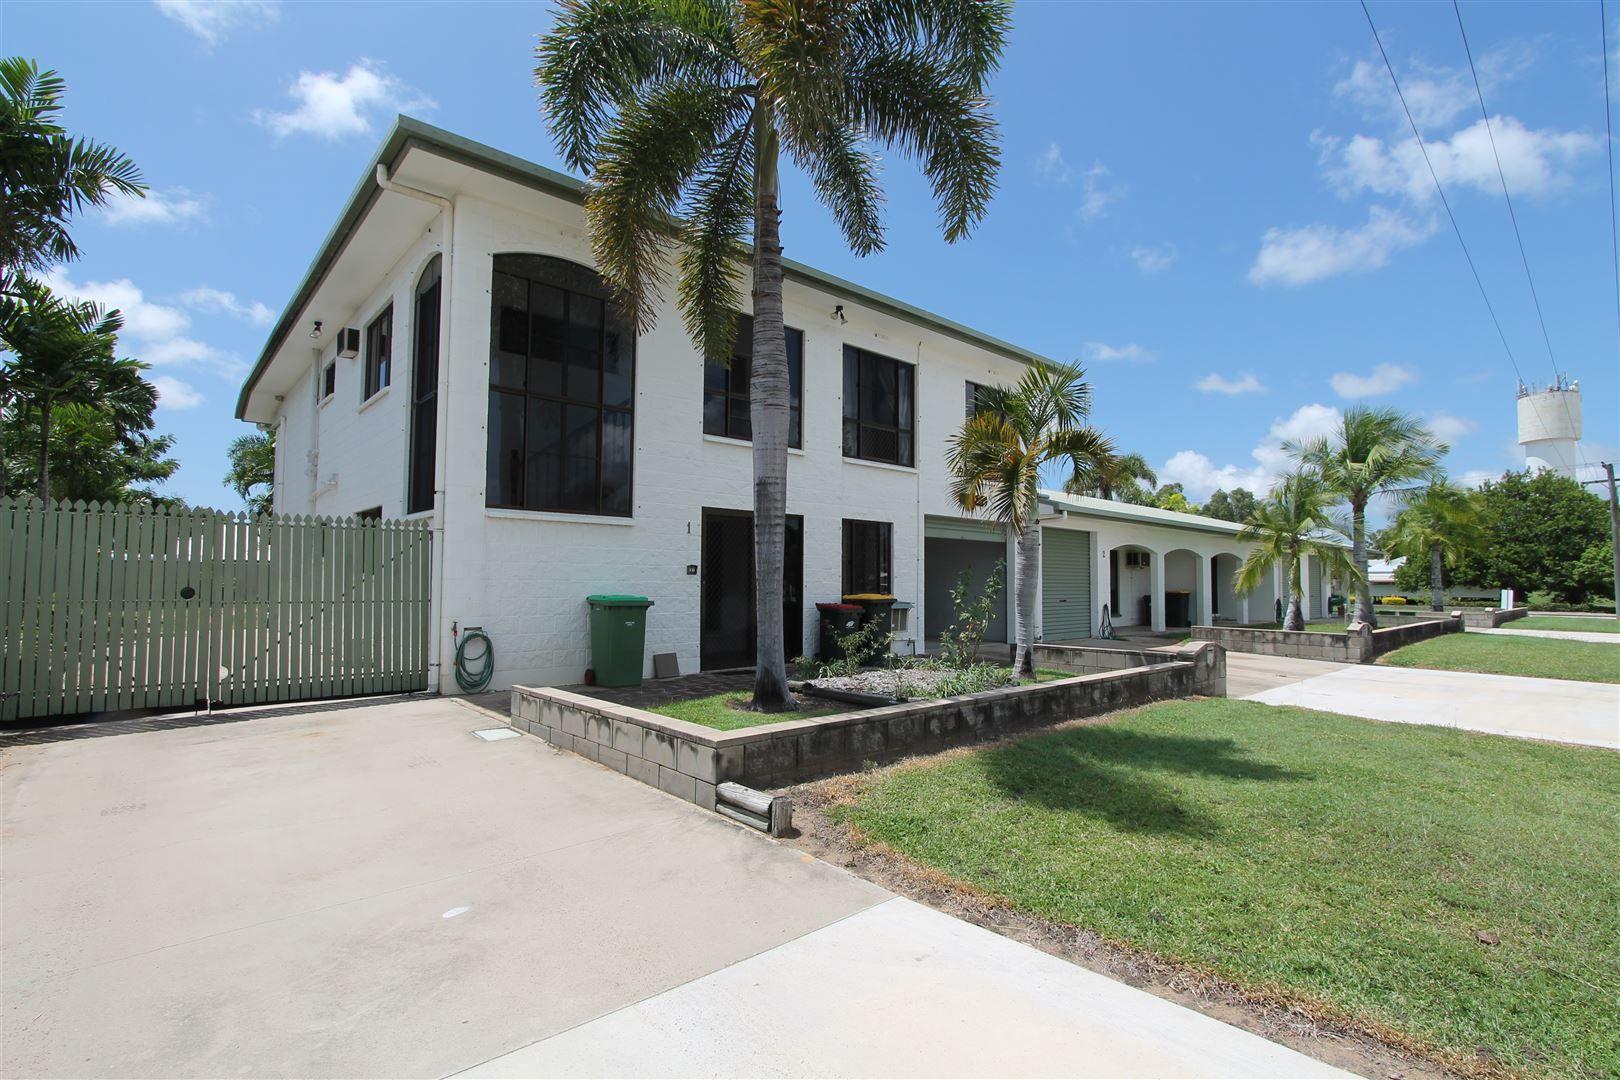 1B/48-50 Spiller Street, Ayr QLD 4807, Image 0